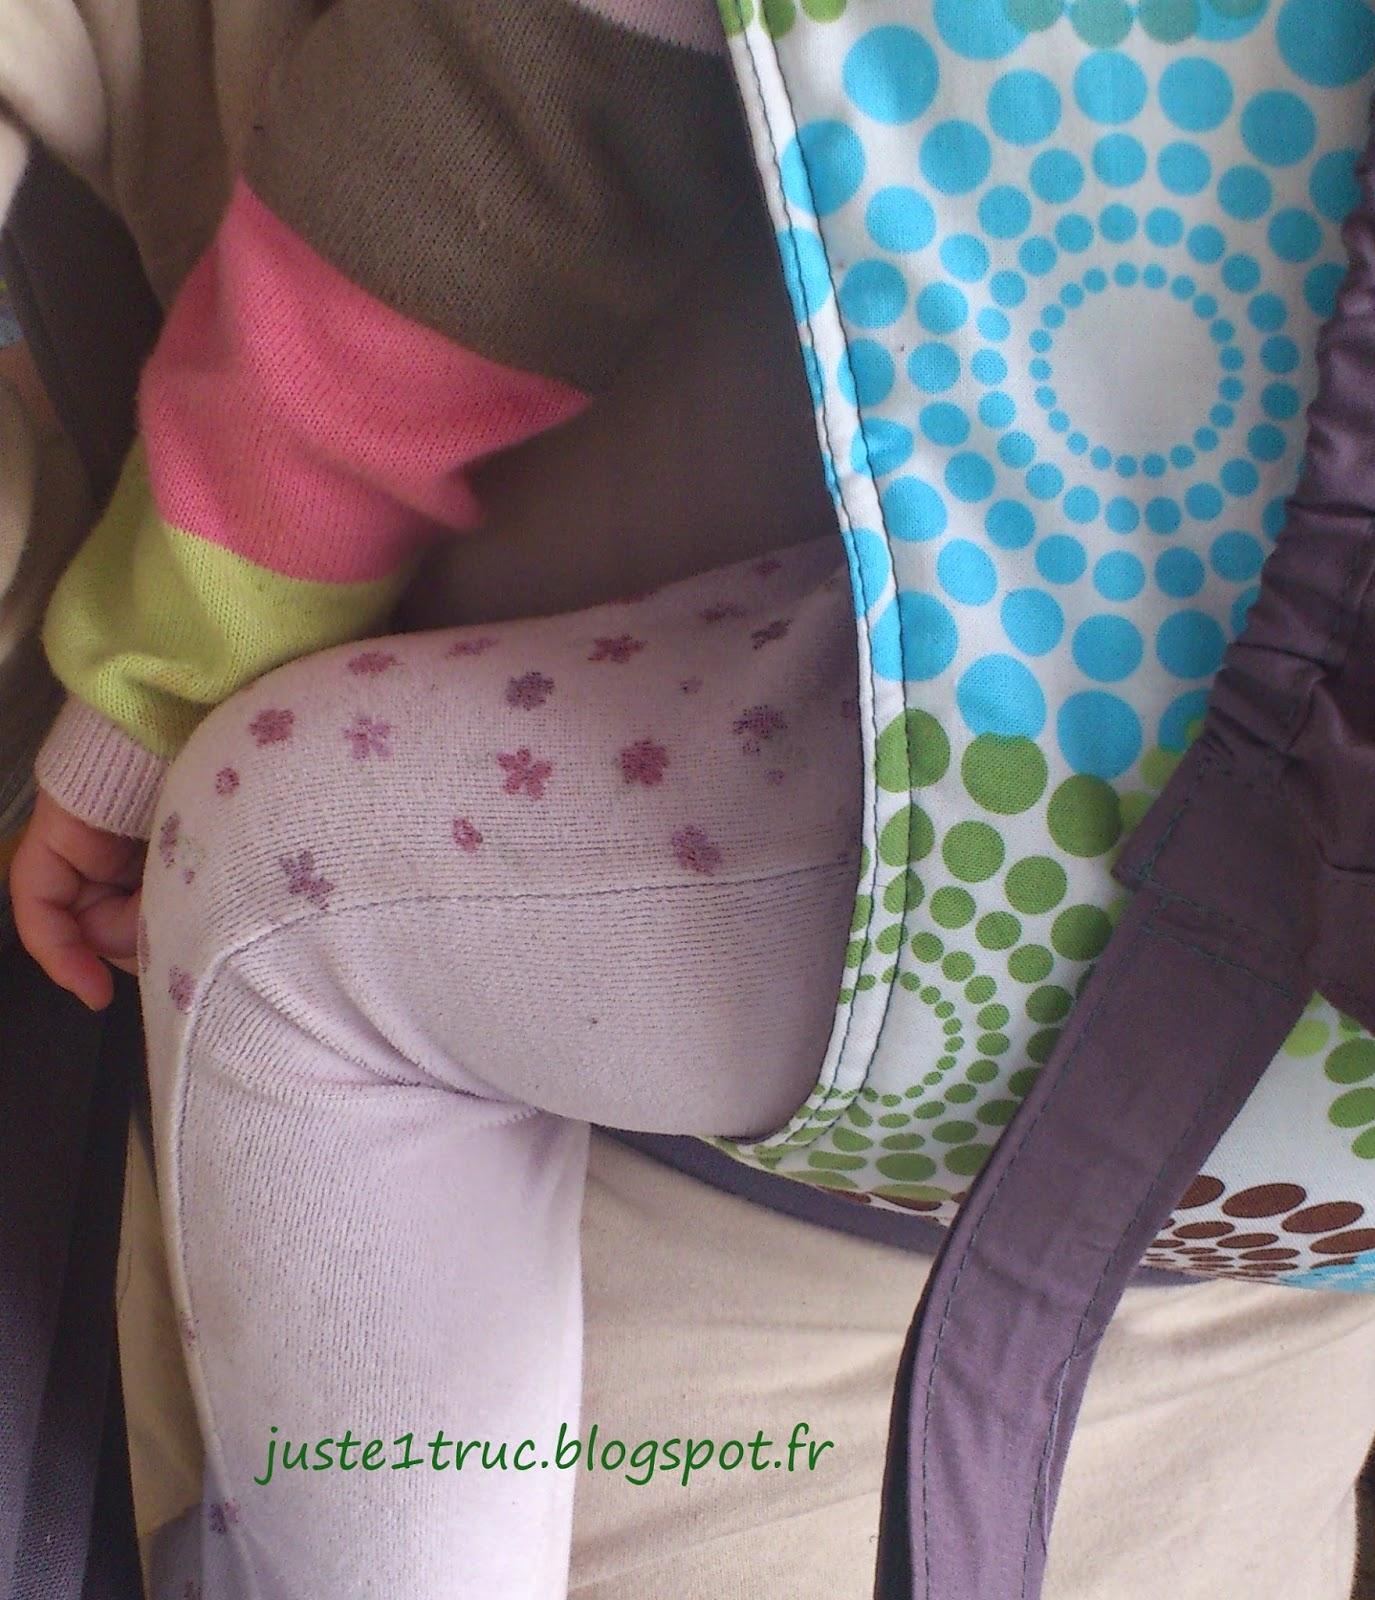 meitai mei-tai meï-taï Liliputi babywearing portage rembourrés à portée de bisous